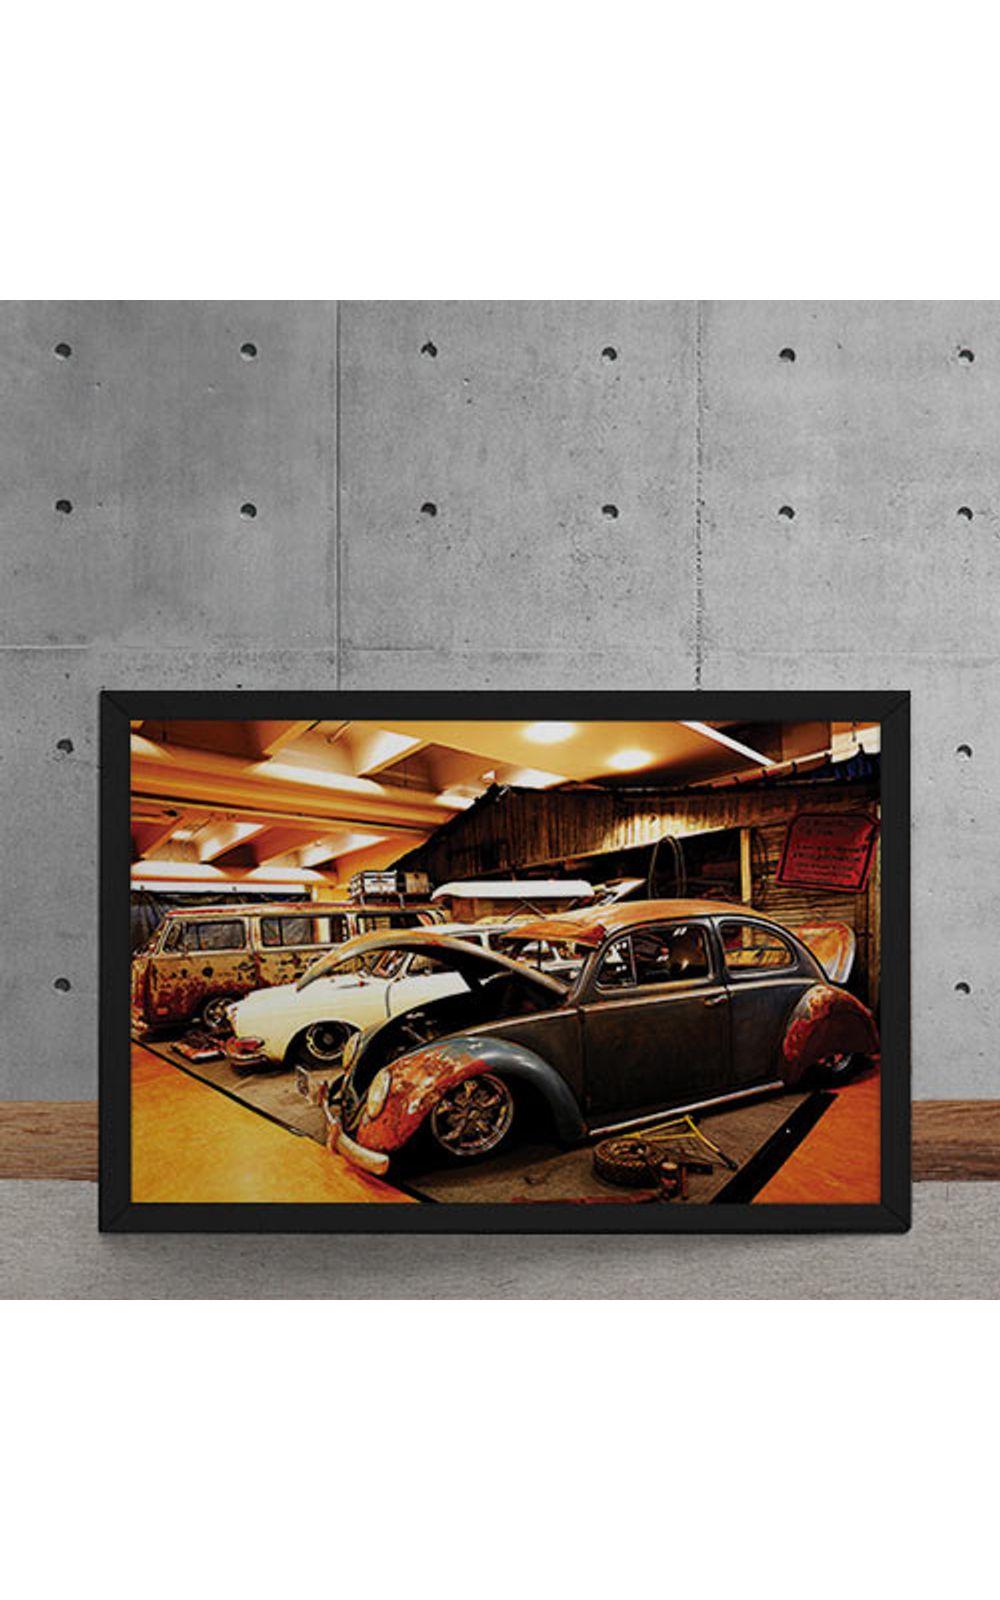 Foto 5 - Quadro Decorativo Carro Volkswagen Rat Look